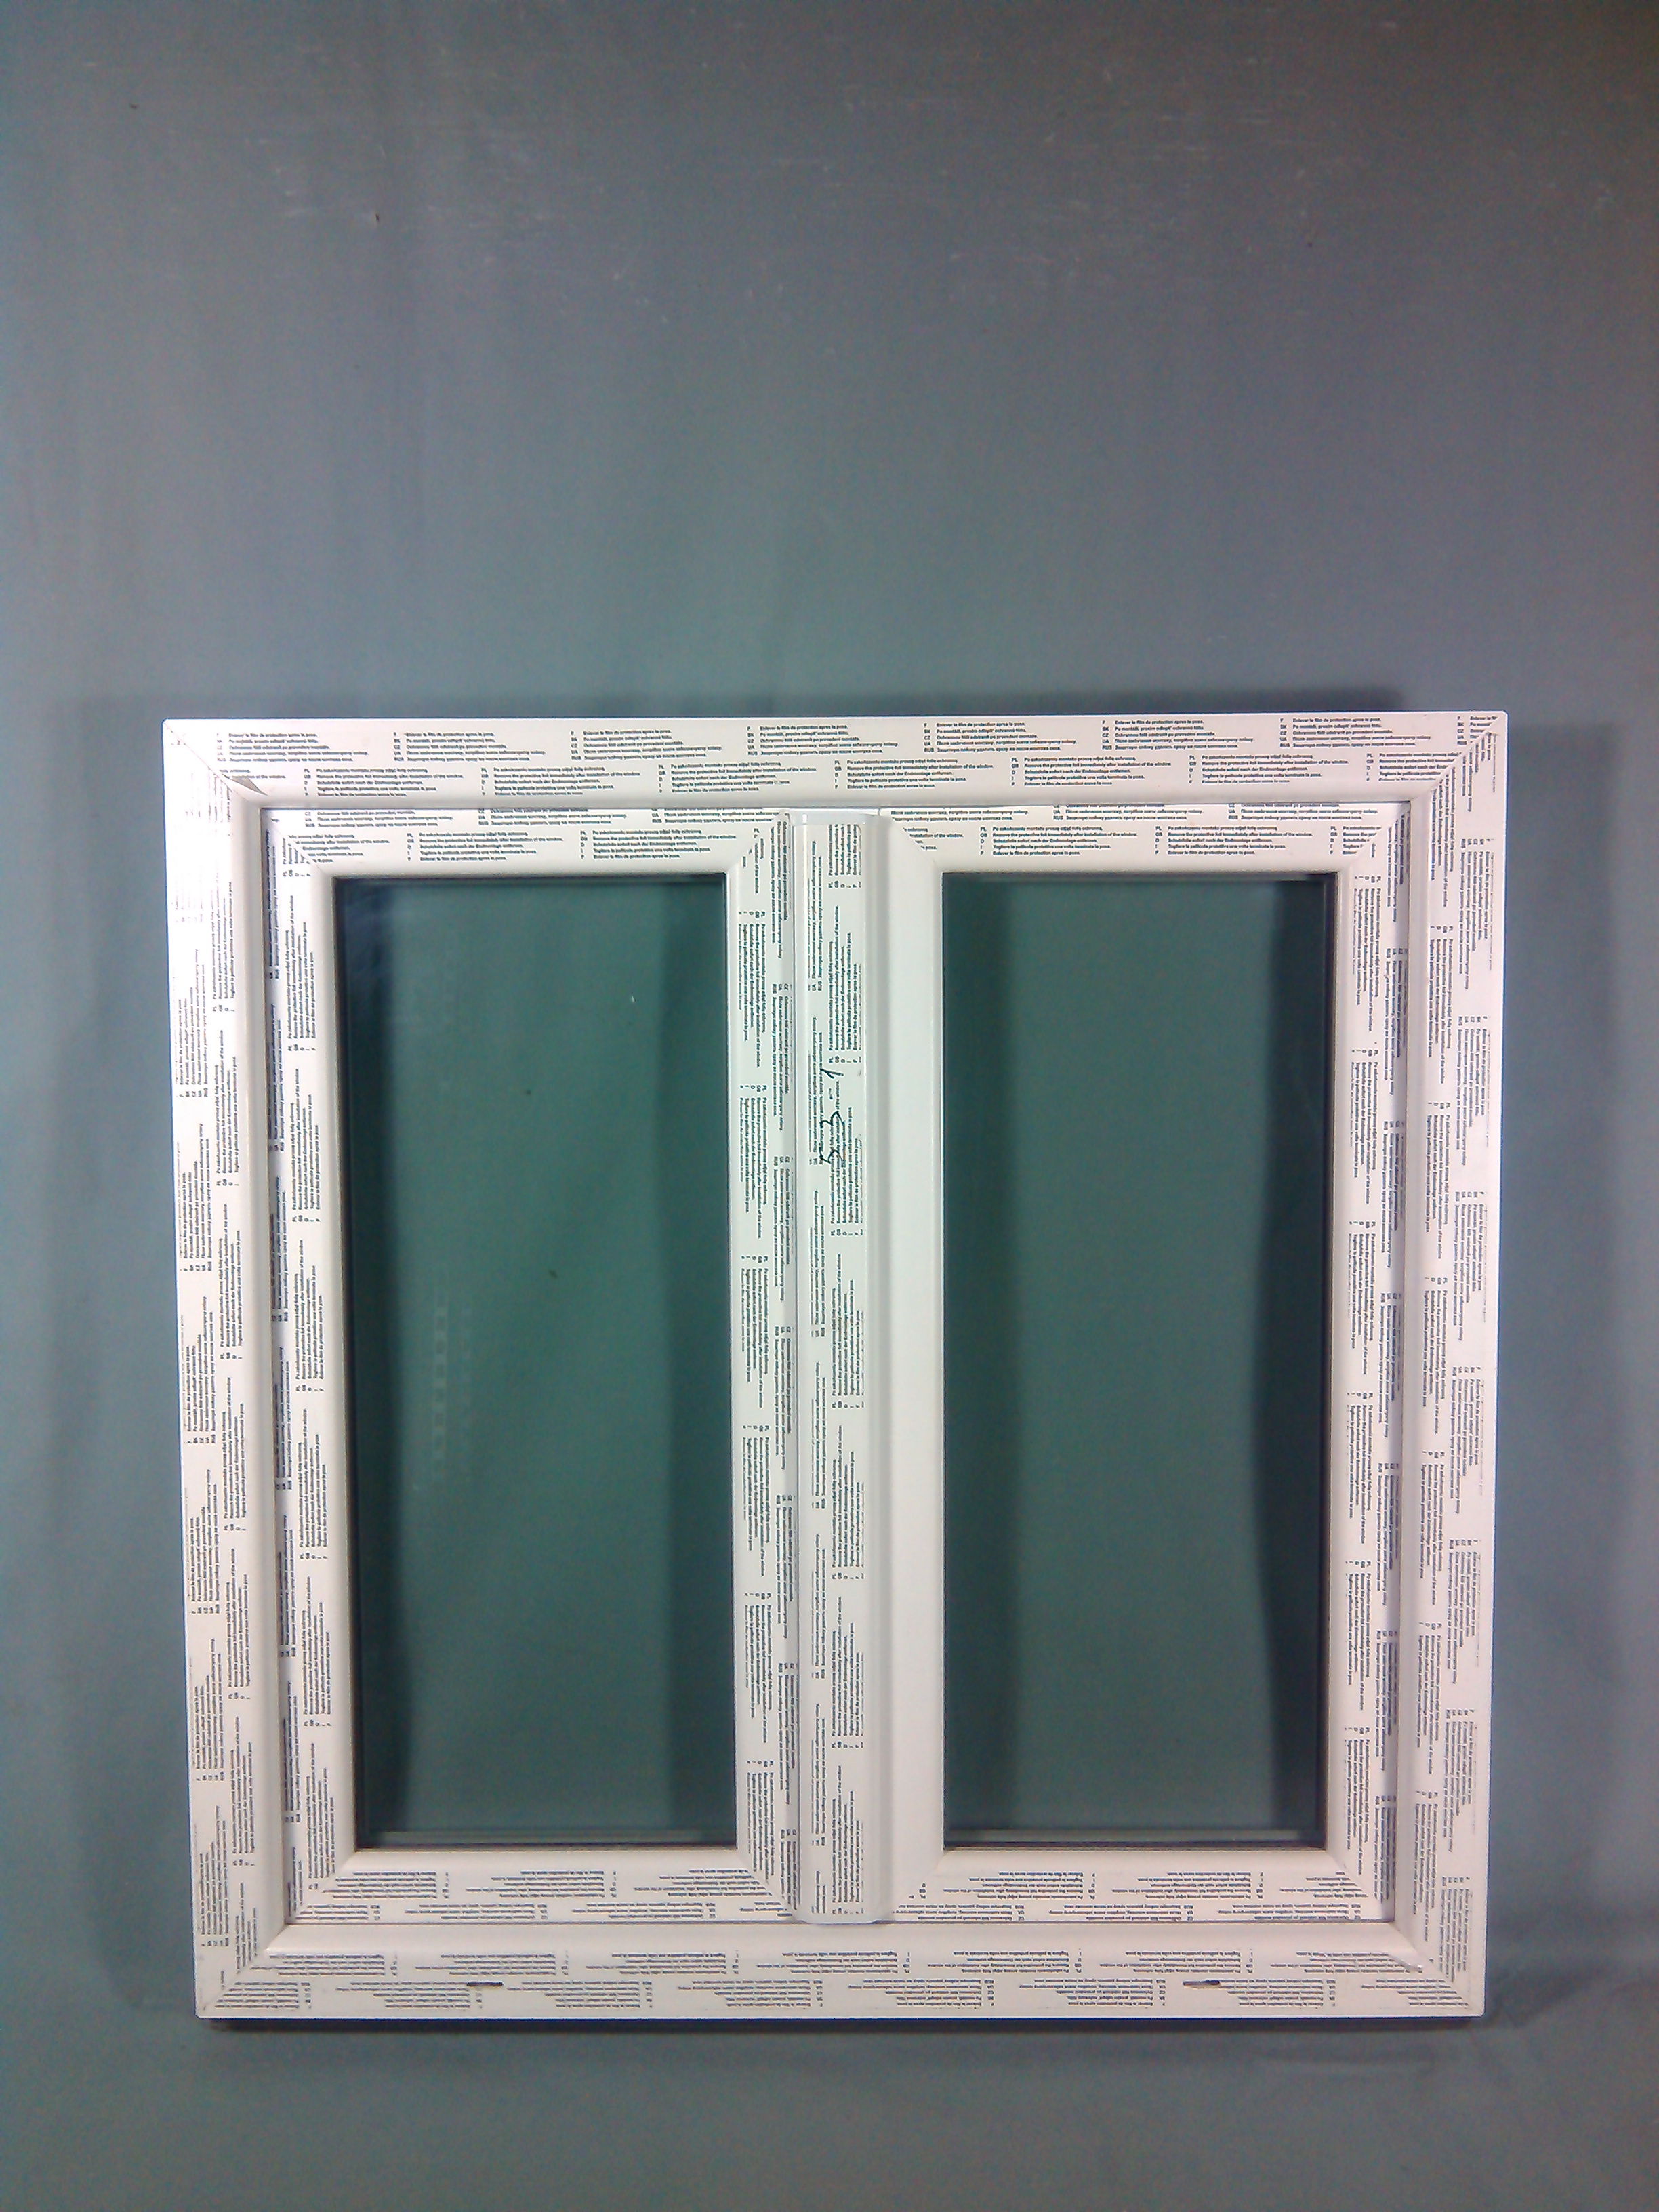 2 Flügel Fenster PVC Weiß  DK-L DK-R  1800 x 1500 Breite x Höhe in mm